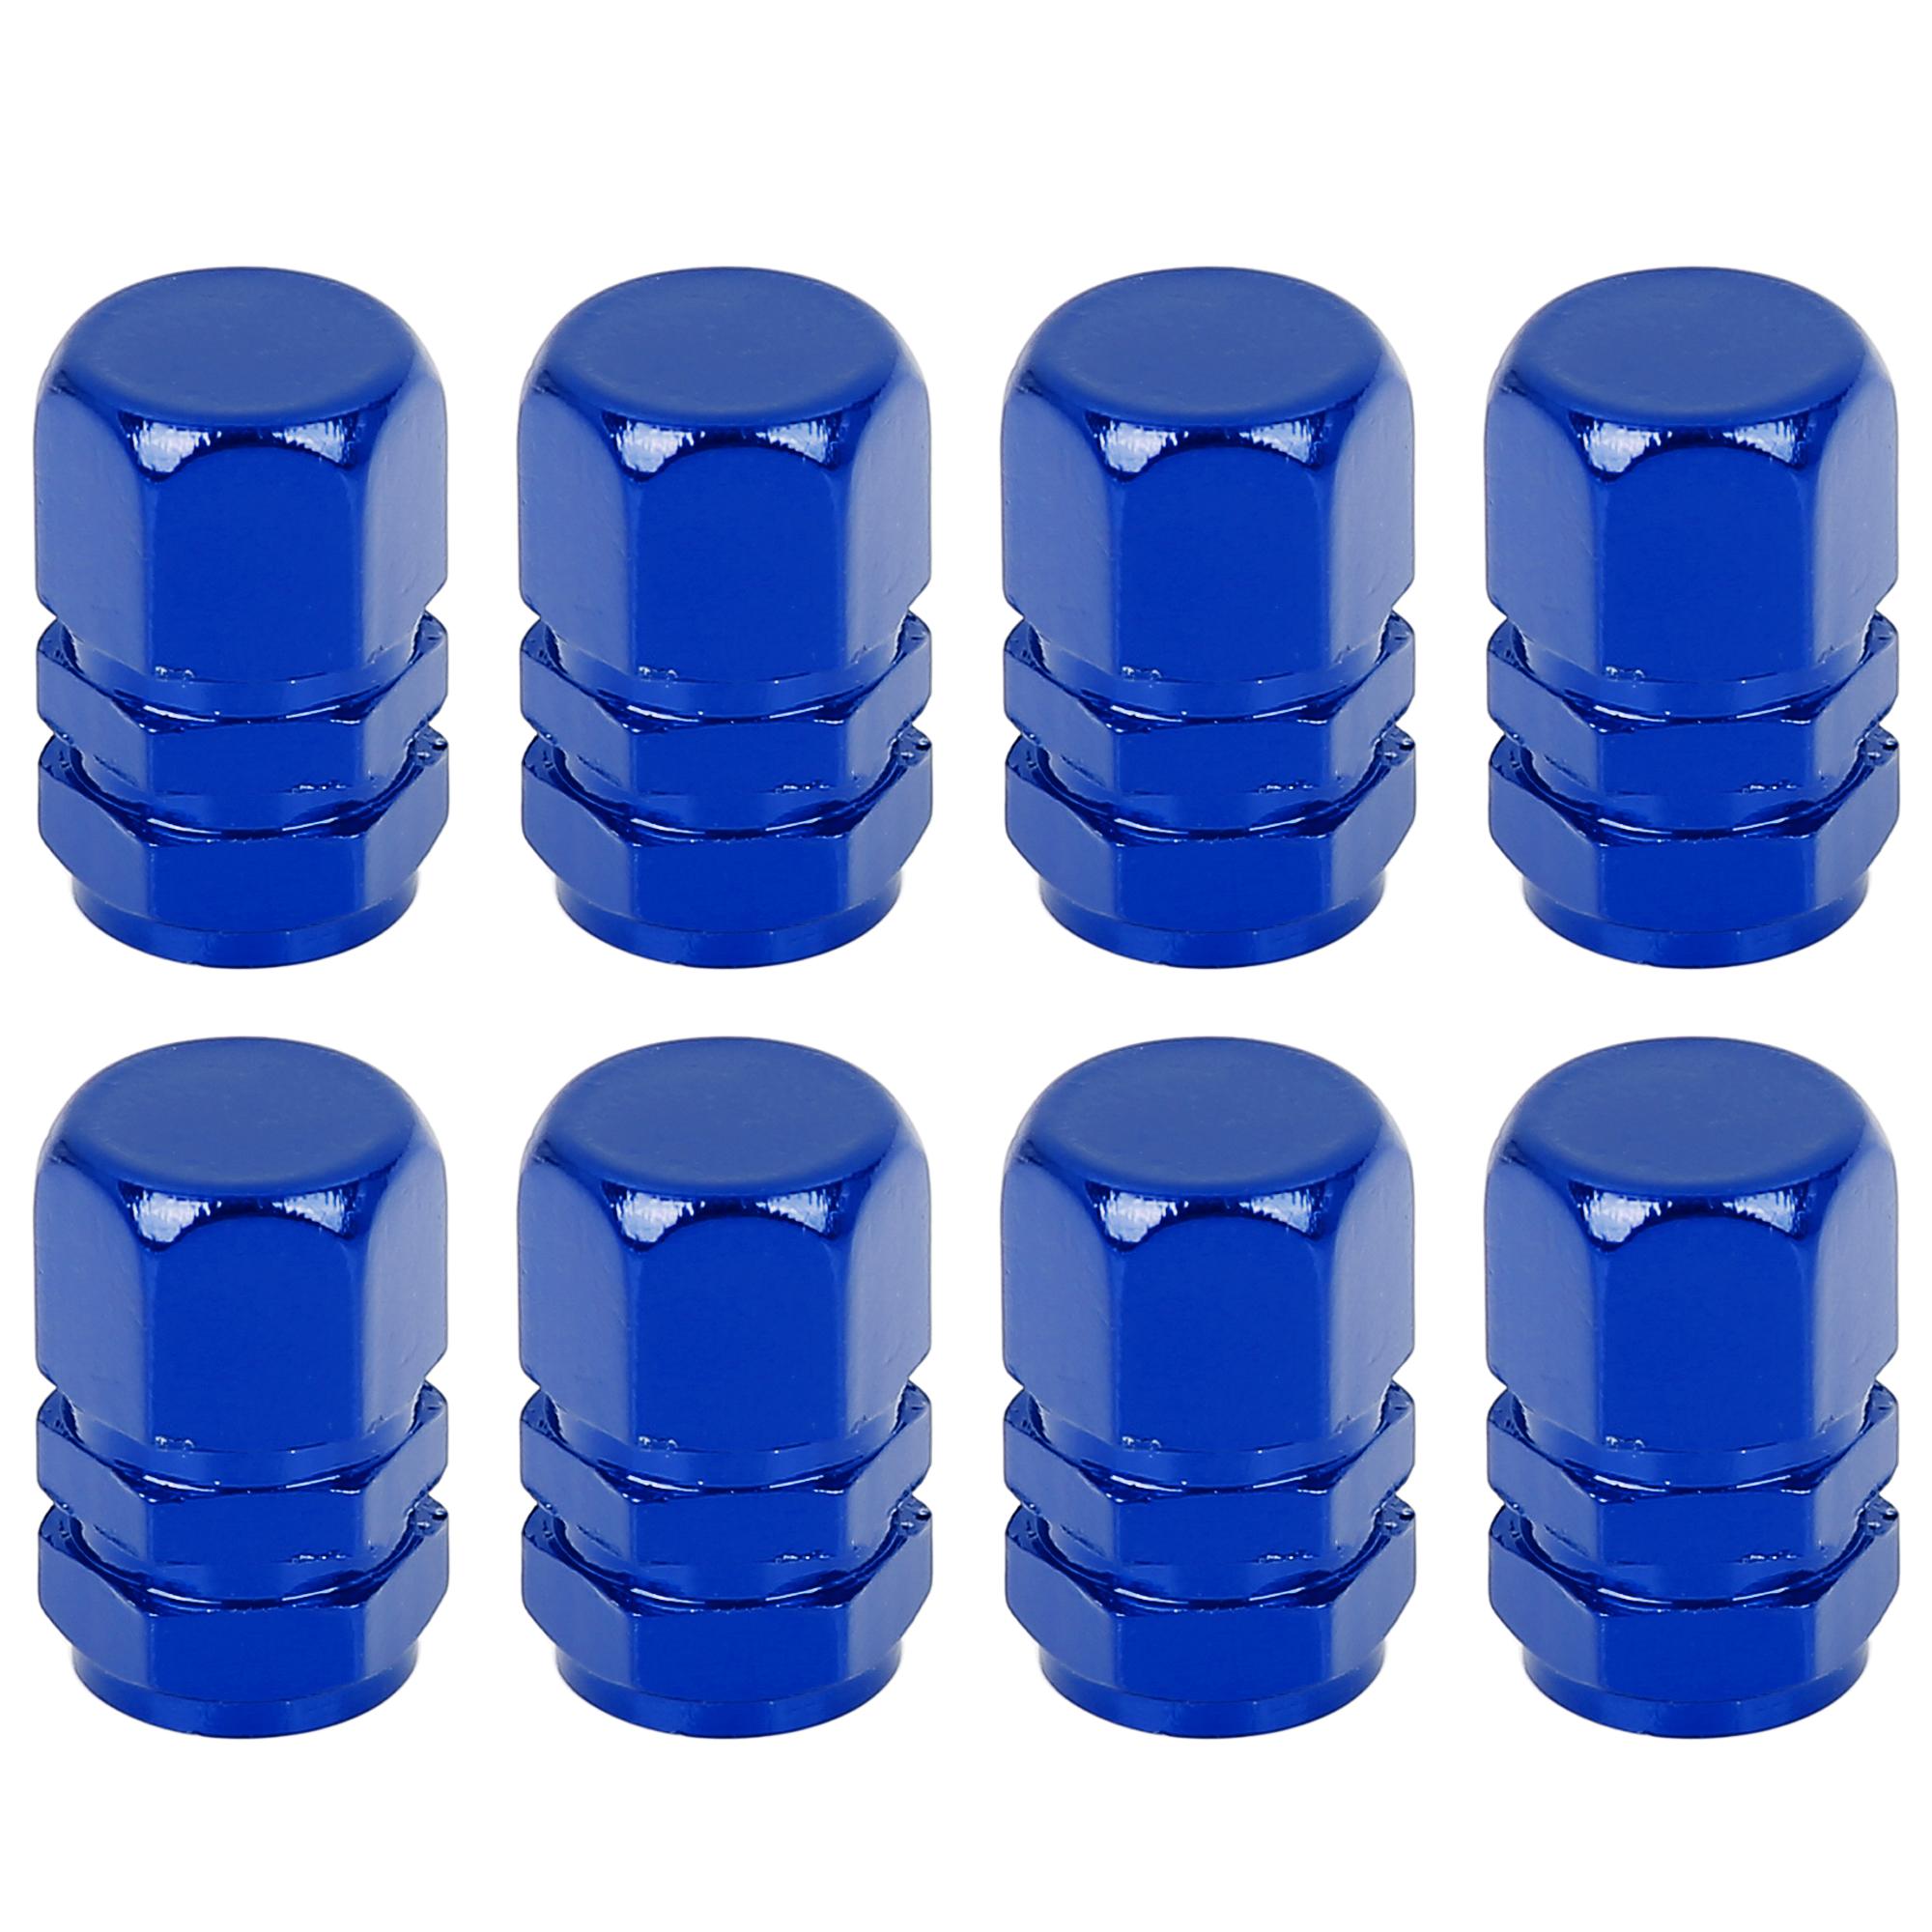 8pcs Navy Blue Tire Stem Valve Caps Car Hexagon Shape Aluminium Alloy Tire Cap